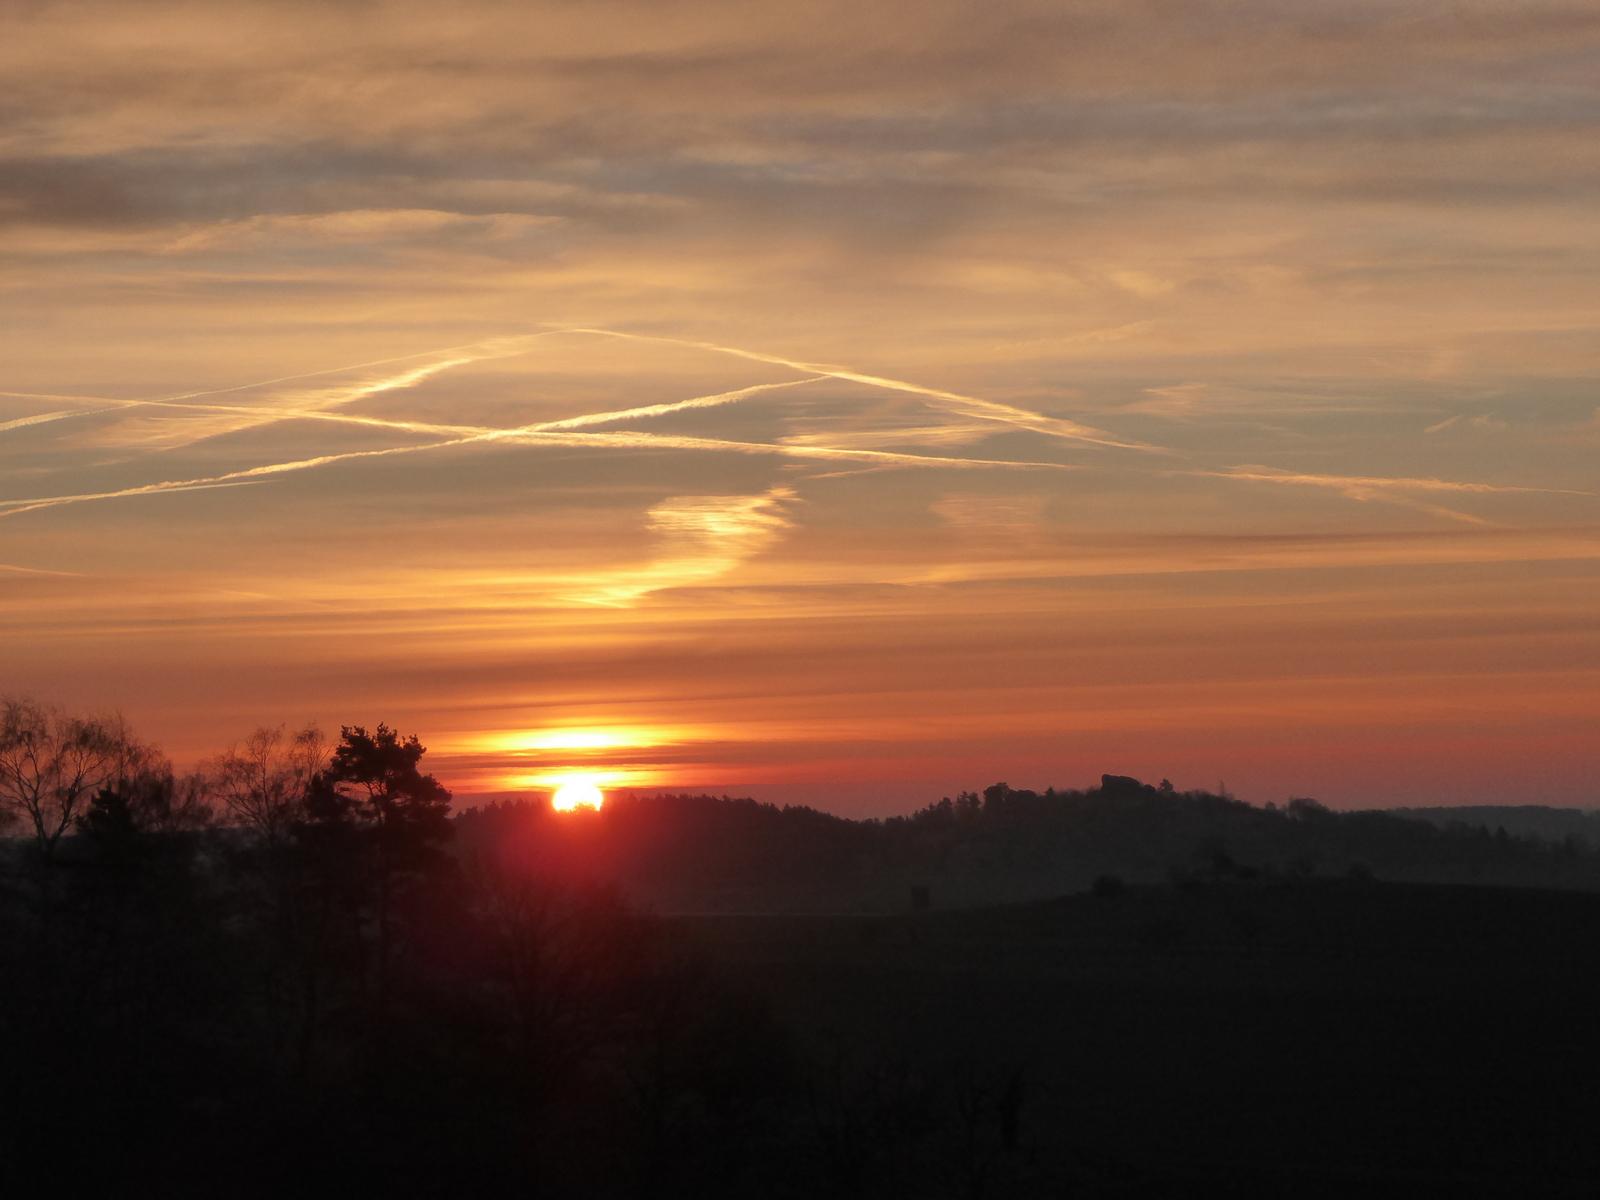 Sonnenaufgang zum Frühjahrsbeginn auf dem Regenstein genau über dem Lehof-Berg